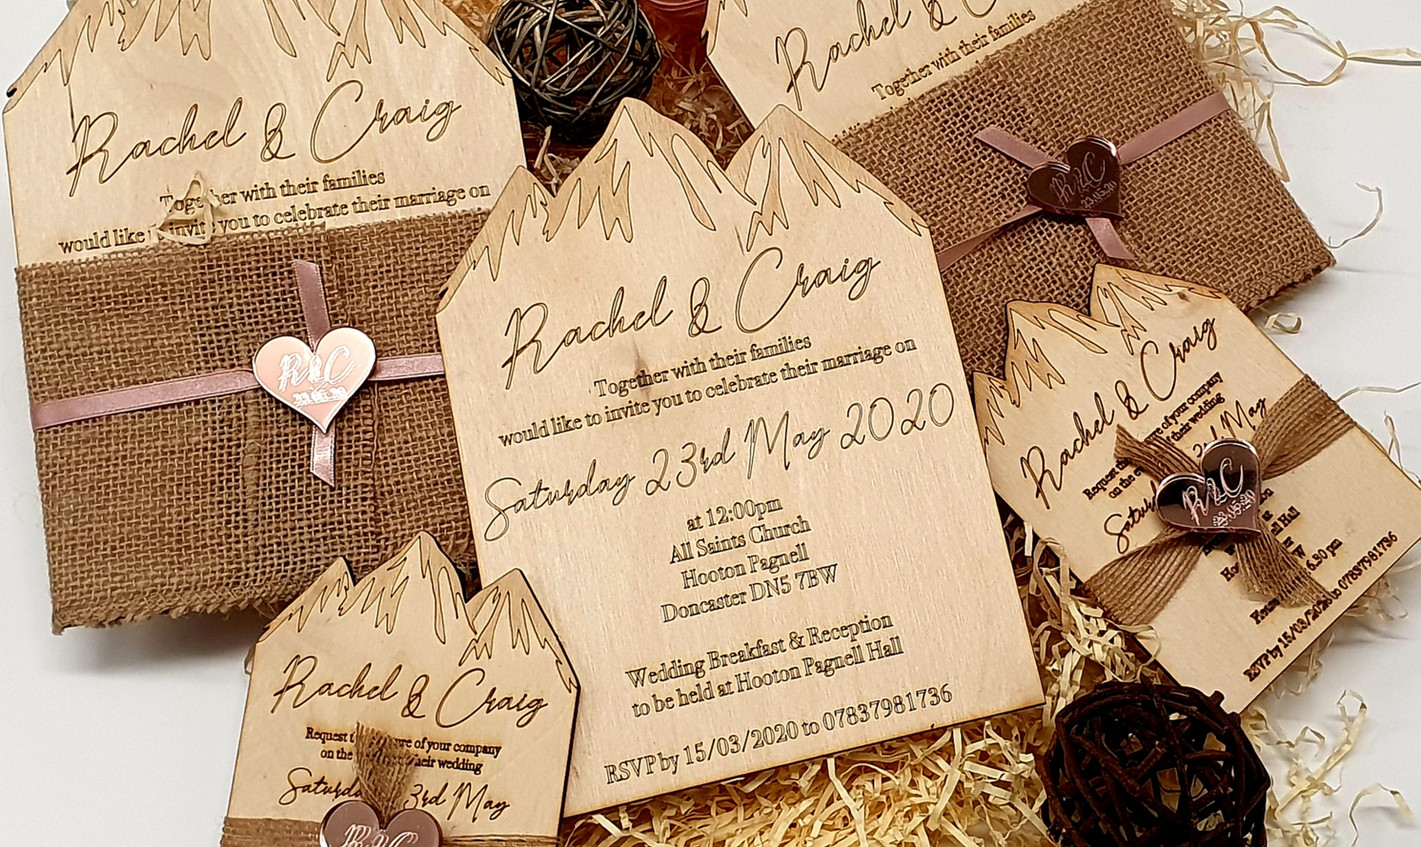 Rachel & Craig's Bespoke Wedding Stationary Suite